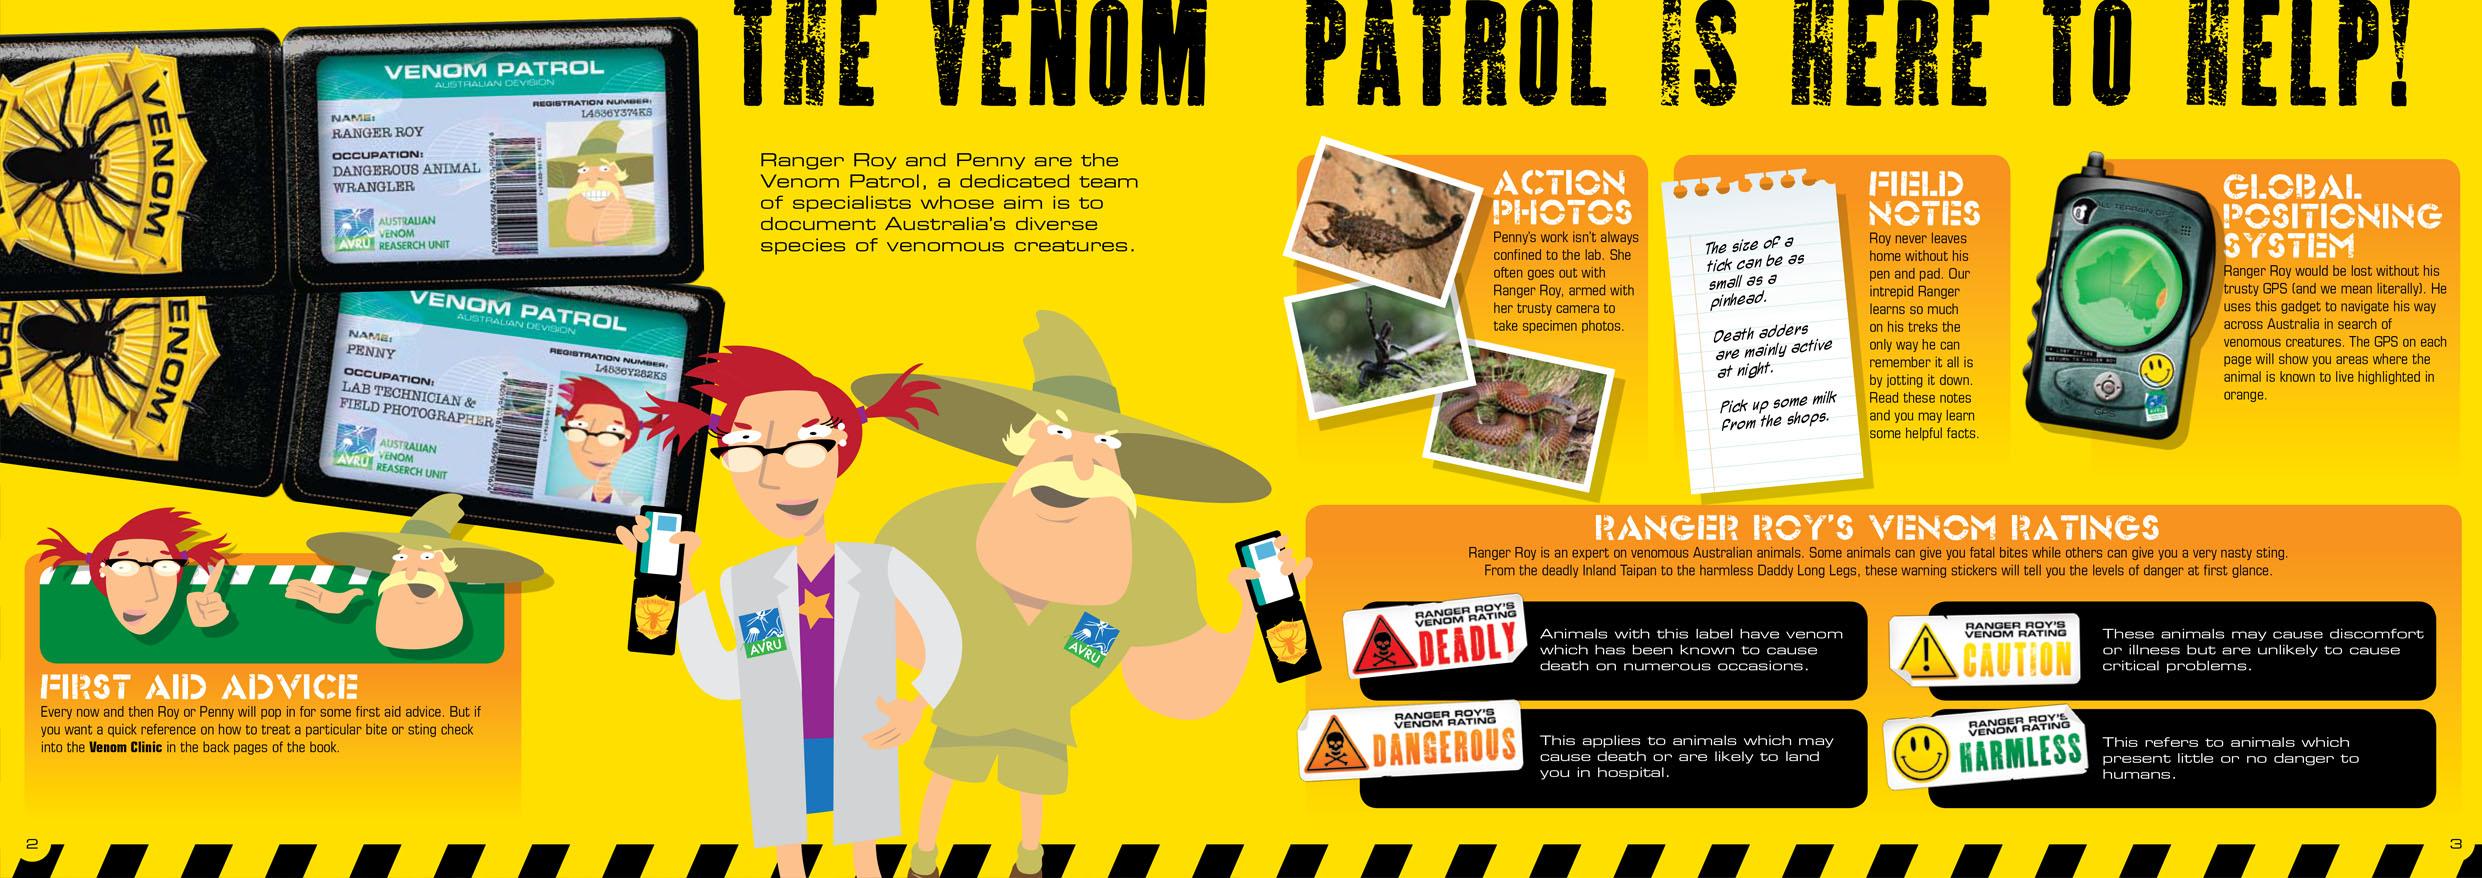 VenomPatrol_2.jpg